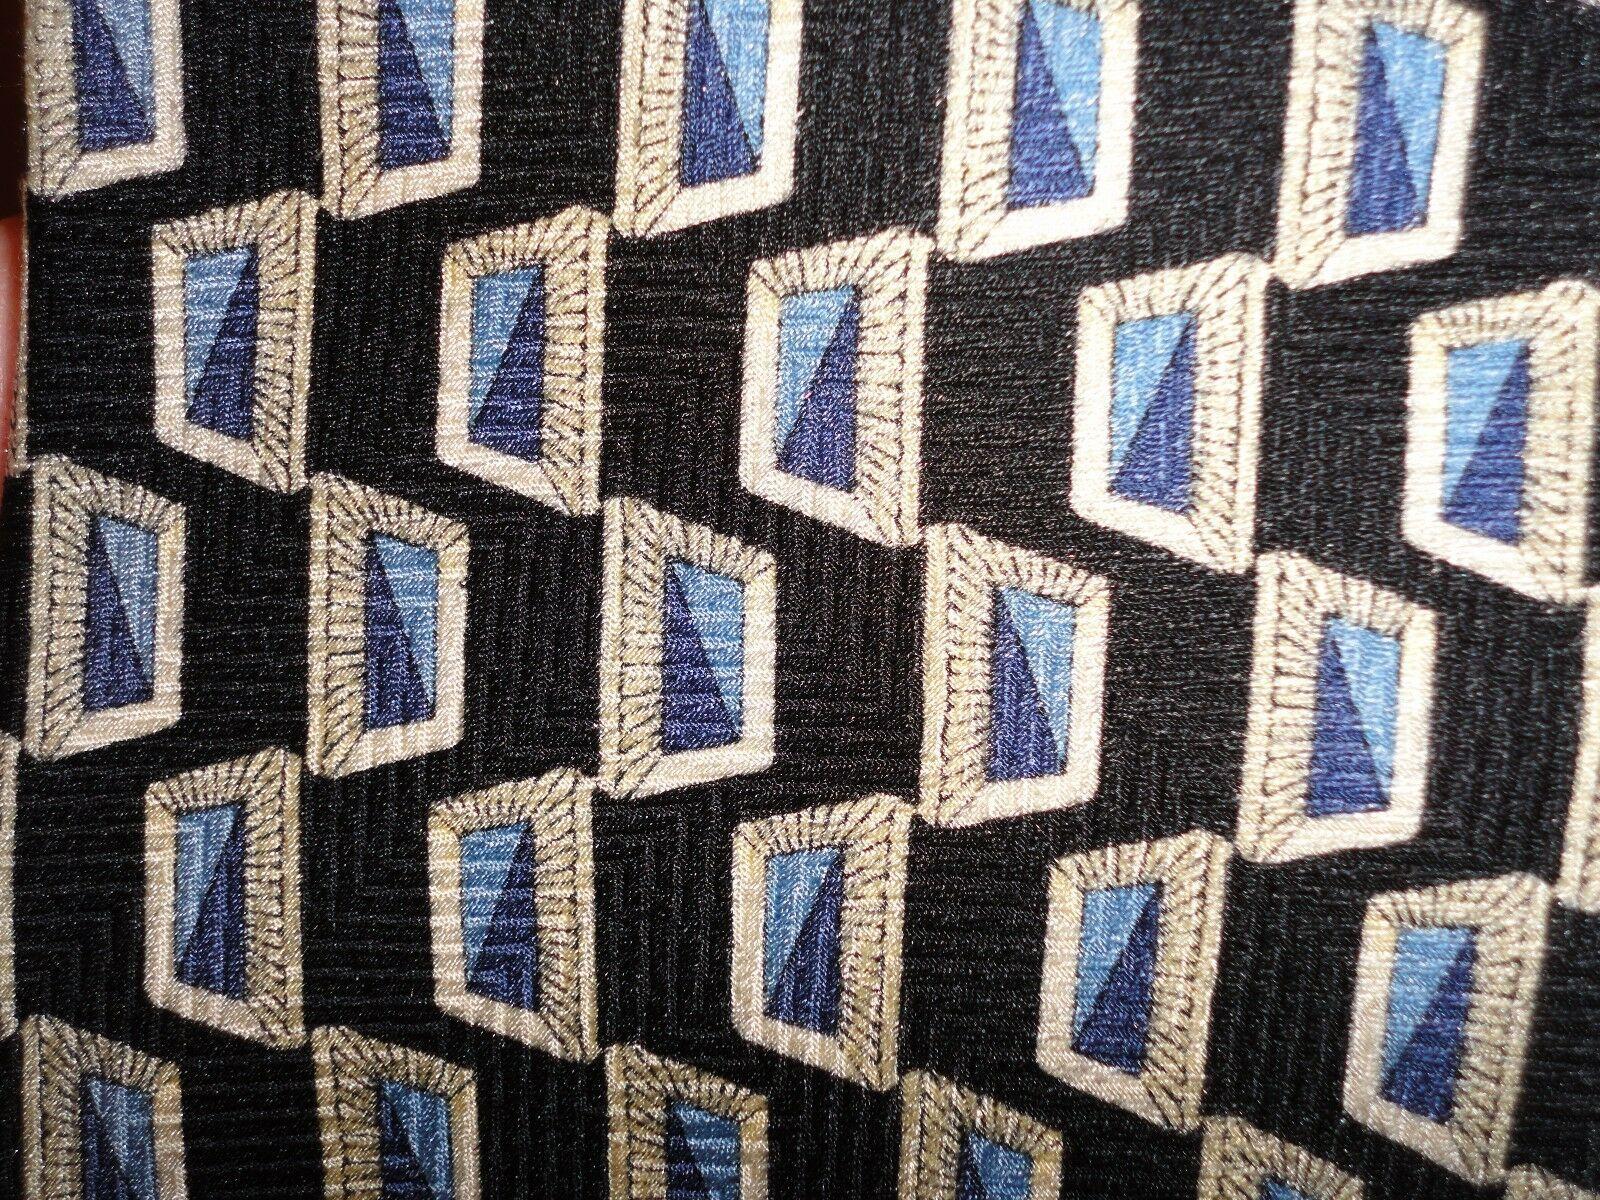 Efenzo Felini Rome Paris All Silk Men's tie Blue Abstract pattern